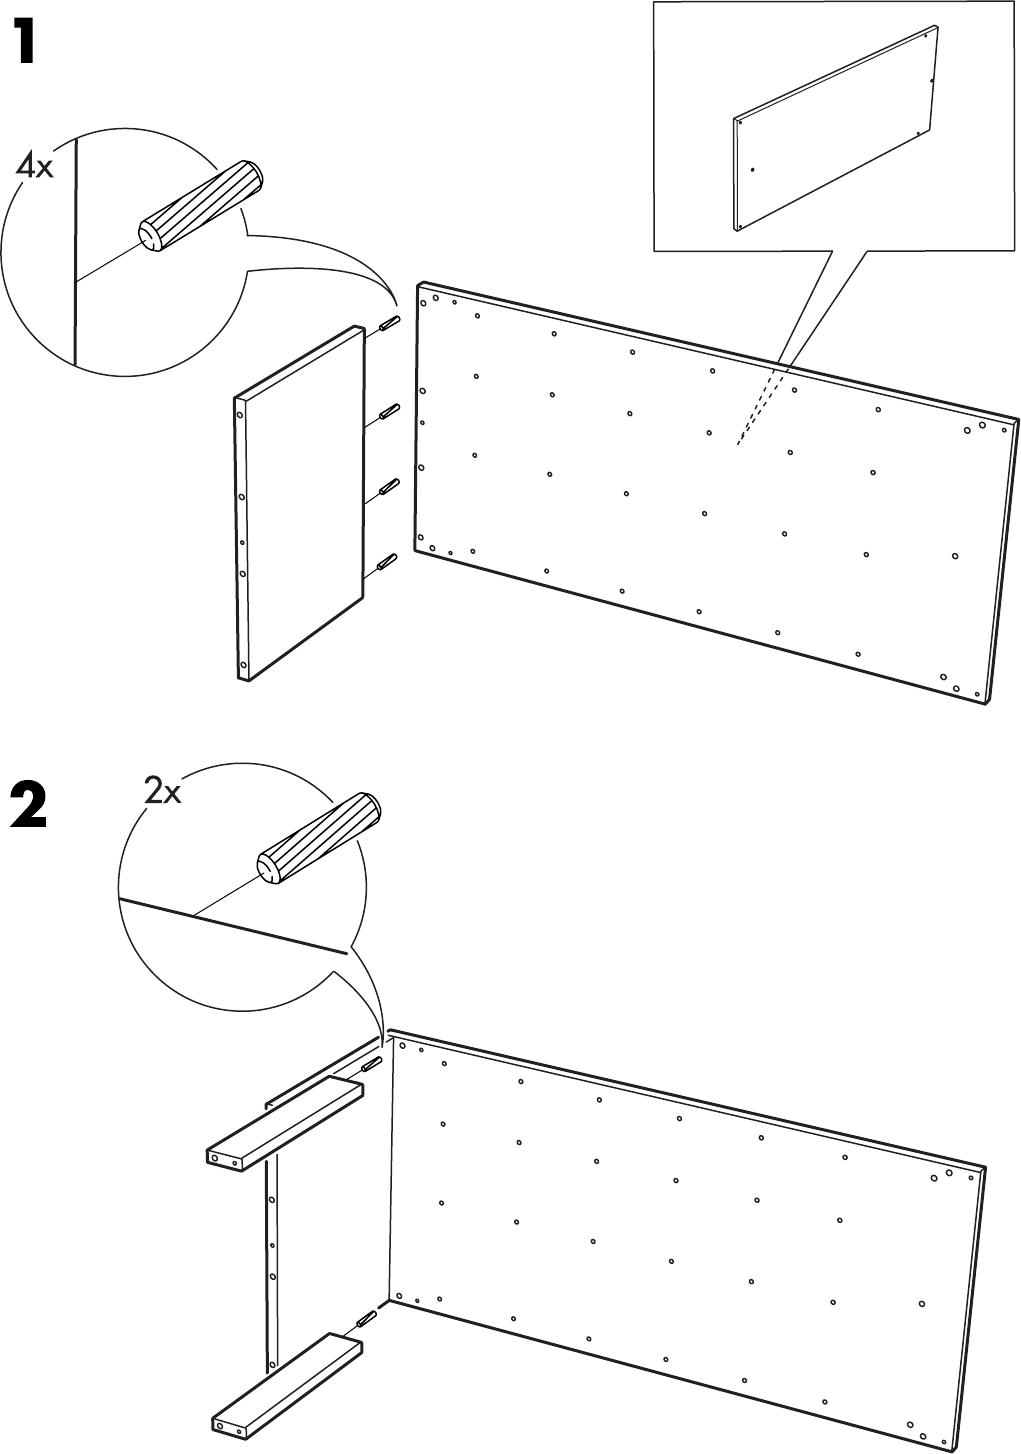 Trofast Opbergkast Ikea.Handleiding Ikea Trofast Basiselement Pagina 1 Van 12 Dansk